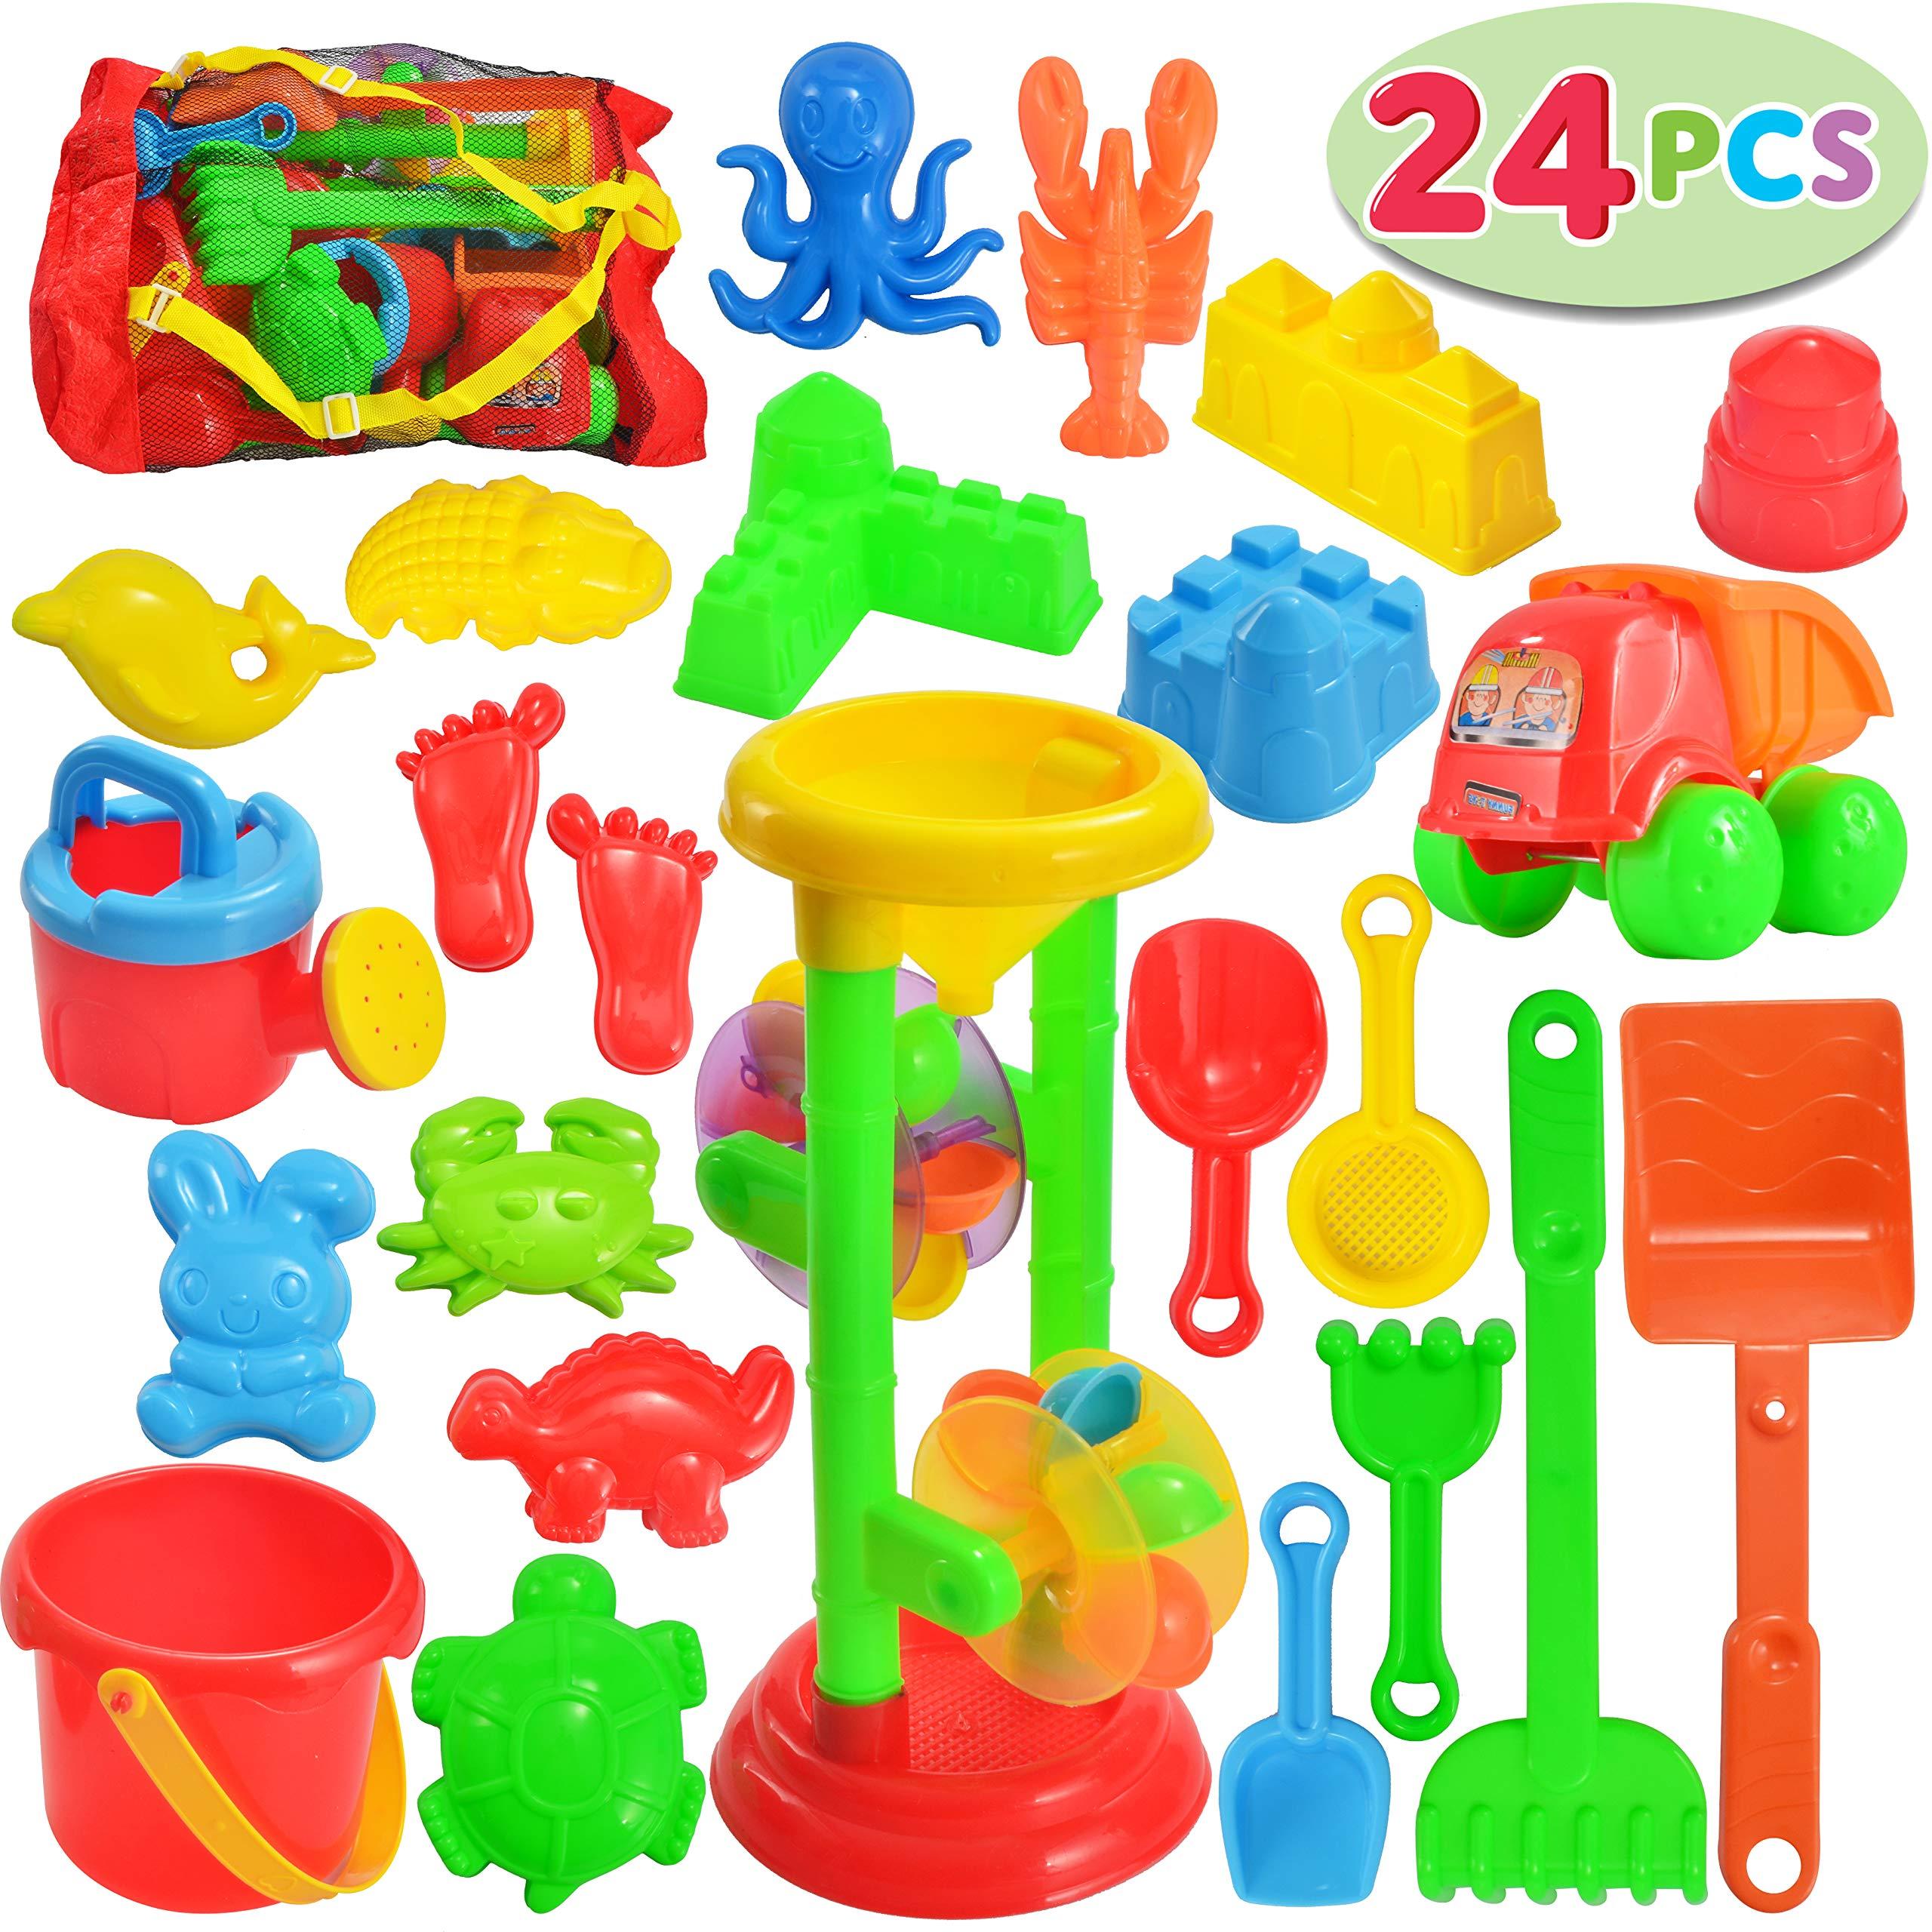 Kids Beach Toys Set Colorful Sand Bucket Water Wheel Beach Molds Sandbox Toys